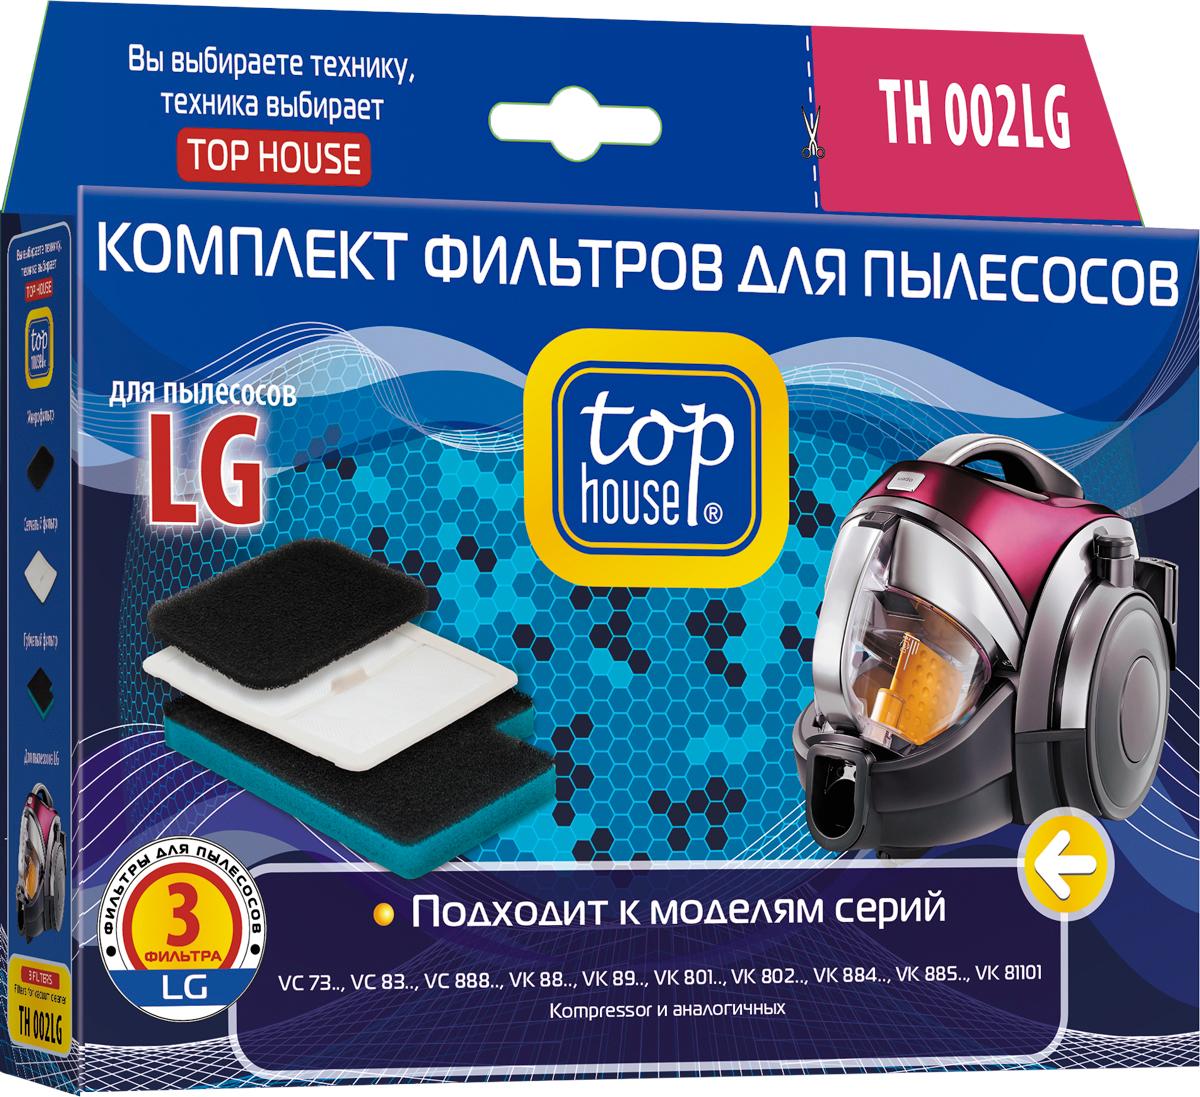 Top House TH 002LG комплект фильтров для пылесосов LG, 3 шт artificial lavender bunch with 5pcs branch